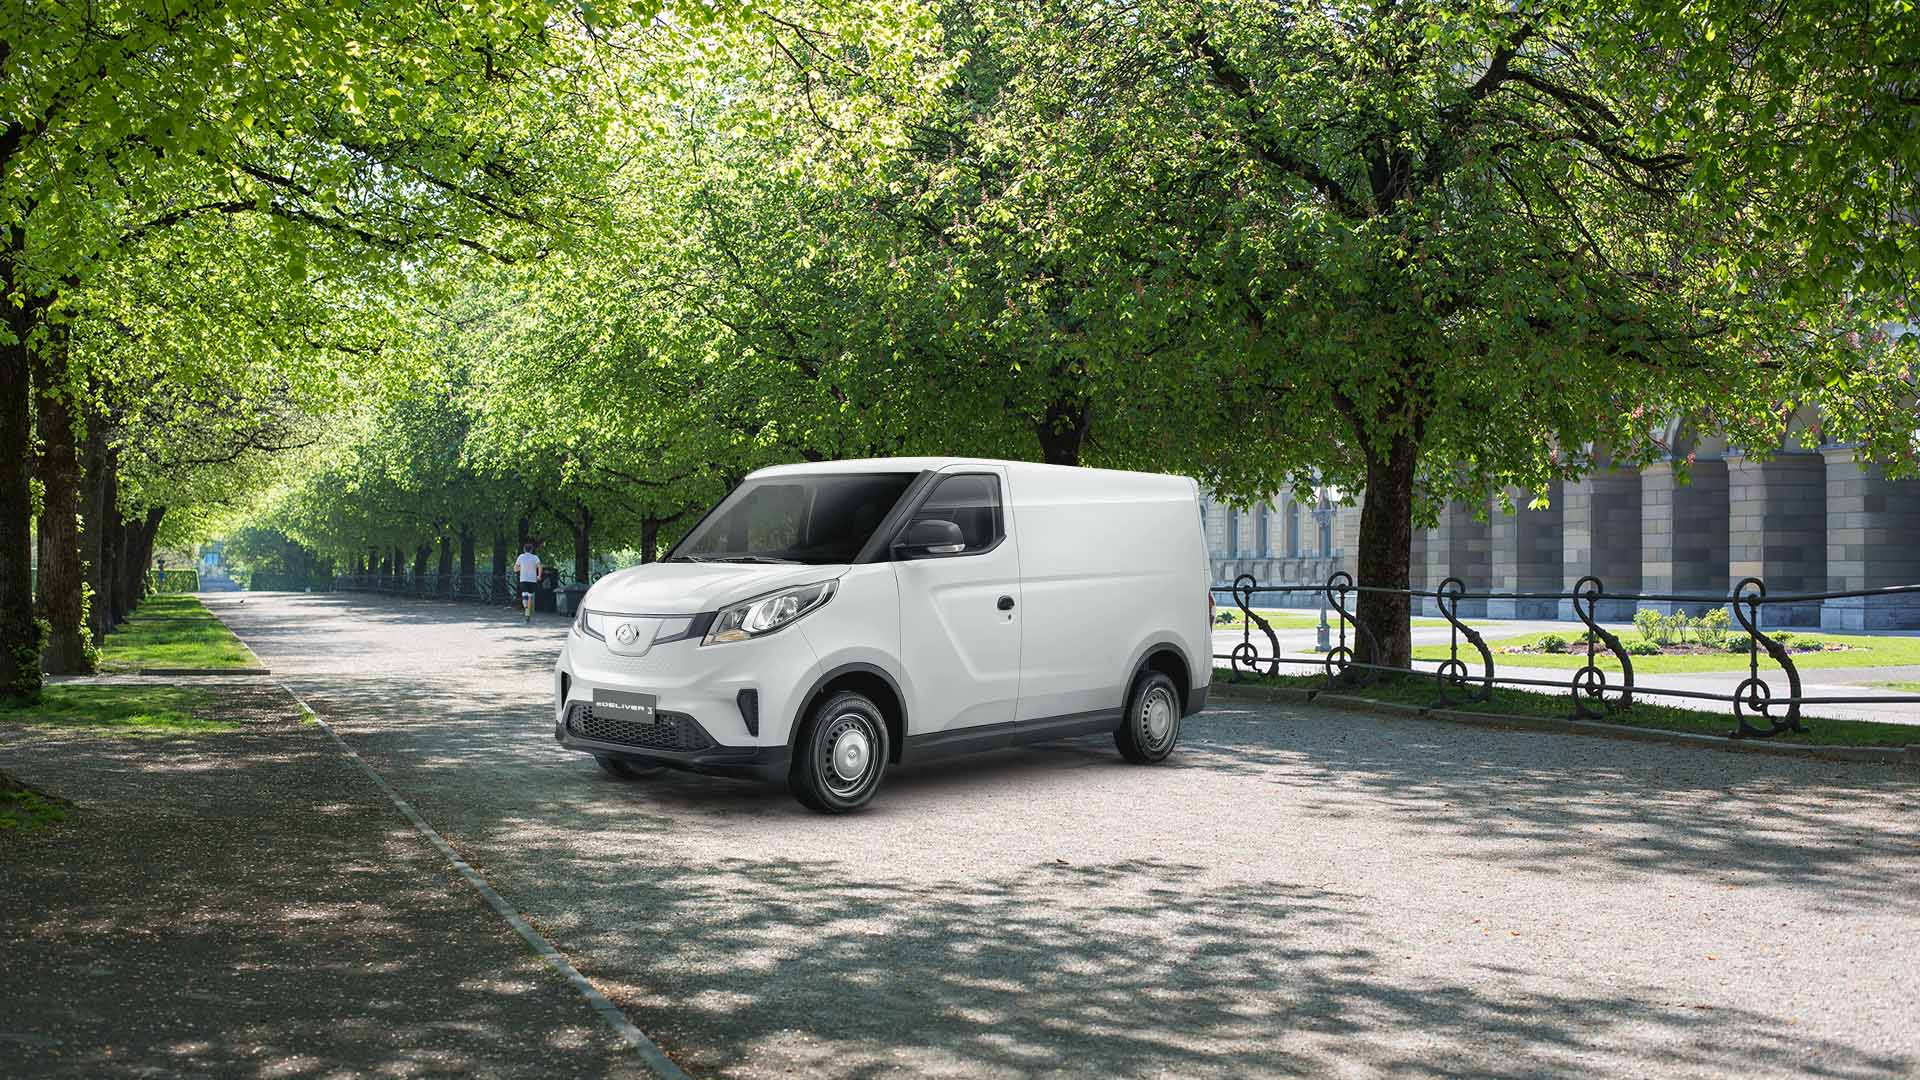 Maxus eDeliver 3 100% elektrisch von Preckel Automobile